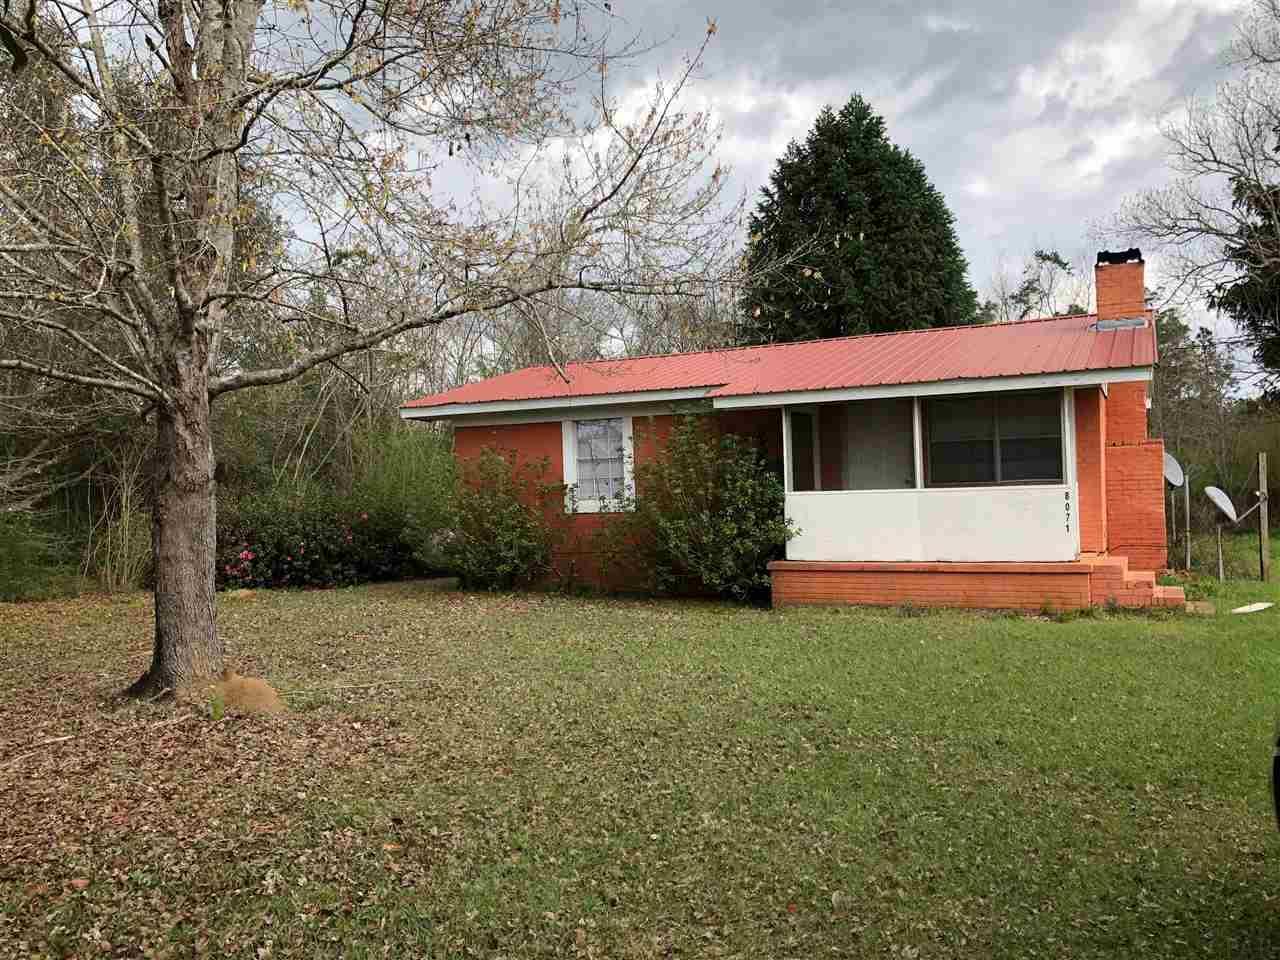 8071 Pine Forest Rd, Mcdavid, FL 32568